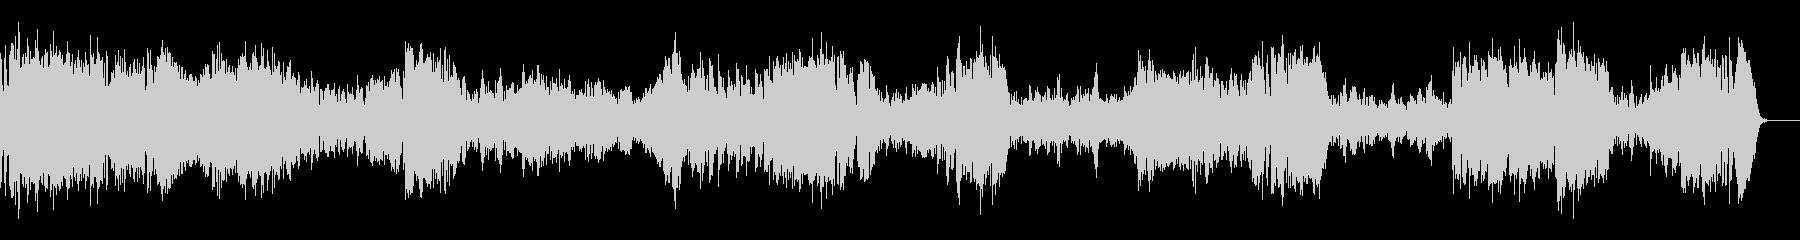 RV522_1『アレグロ』ビバルディの未再生の波形